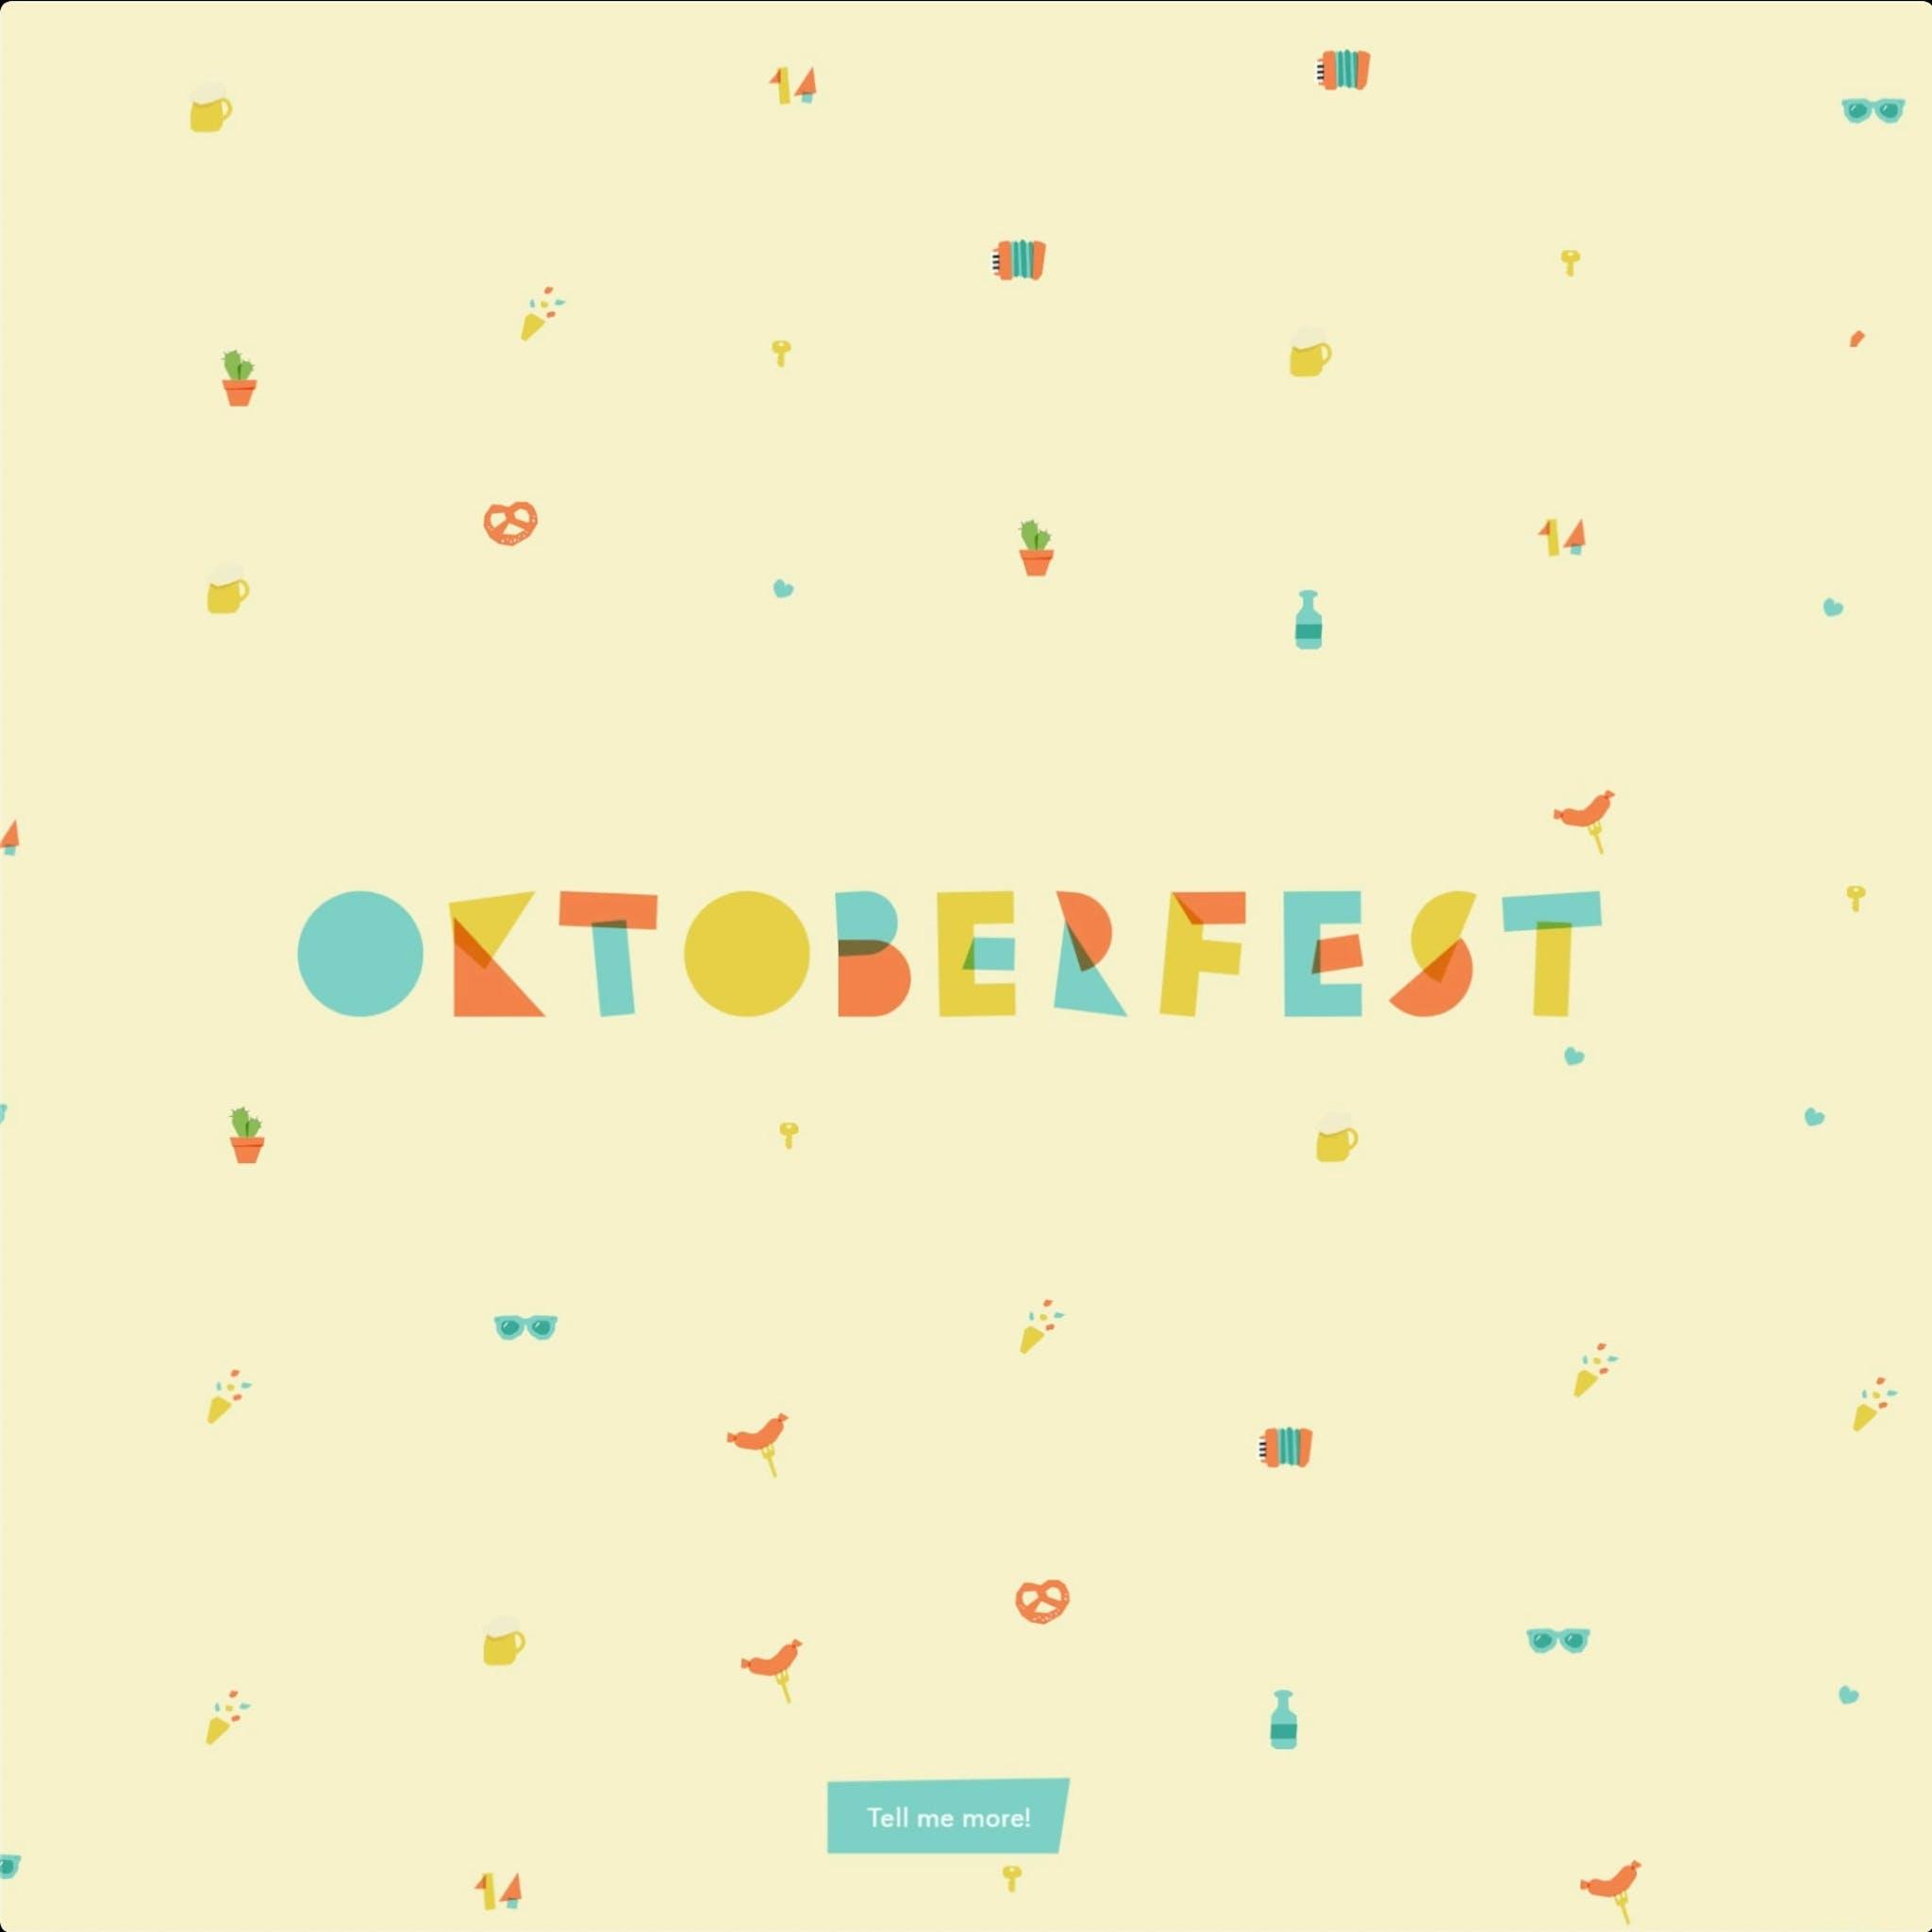 Oktoberfest web experience